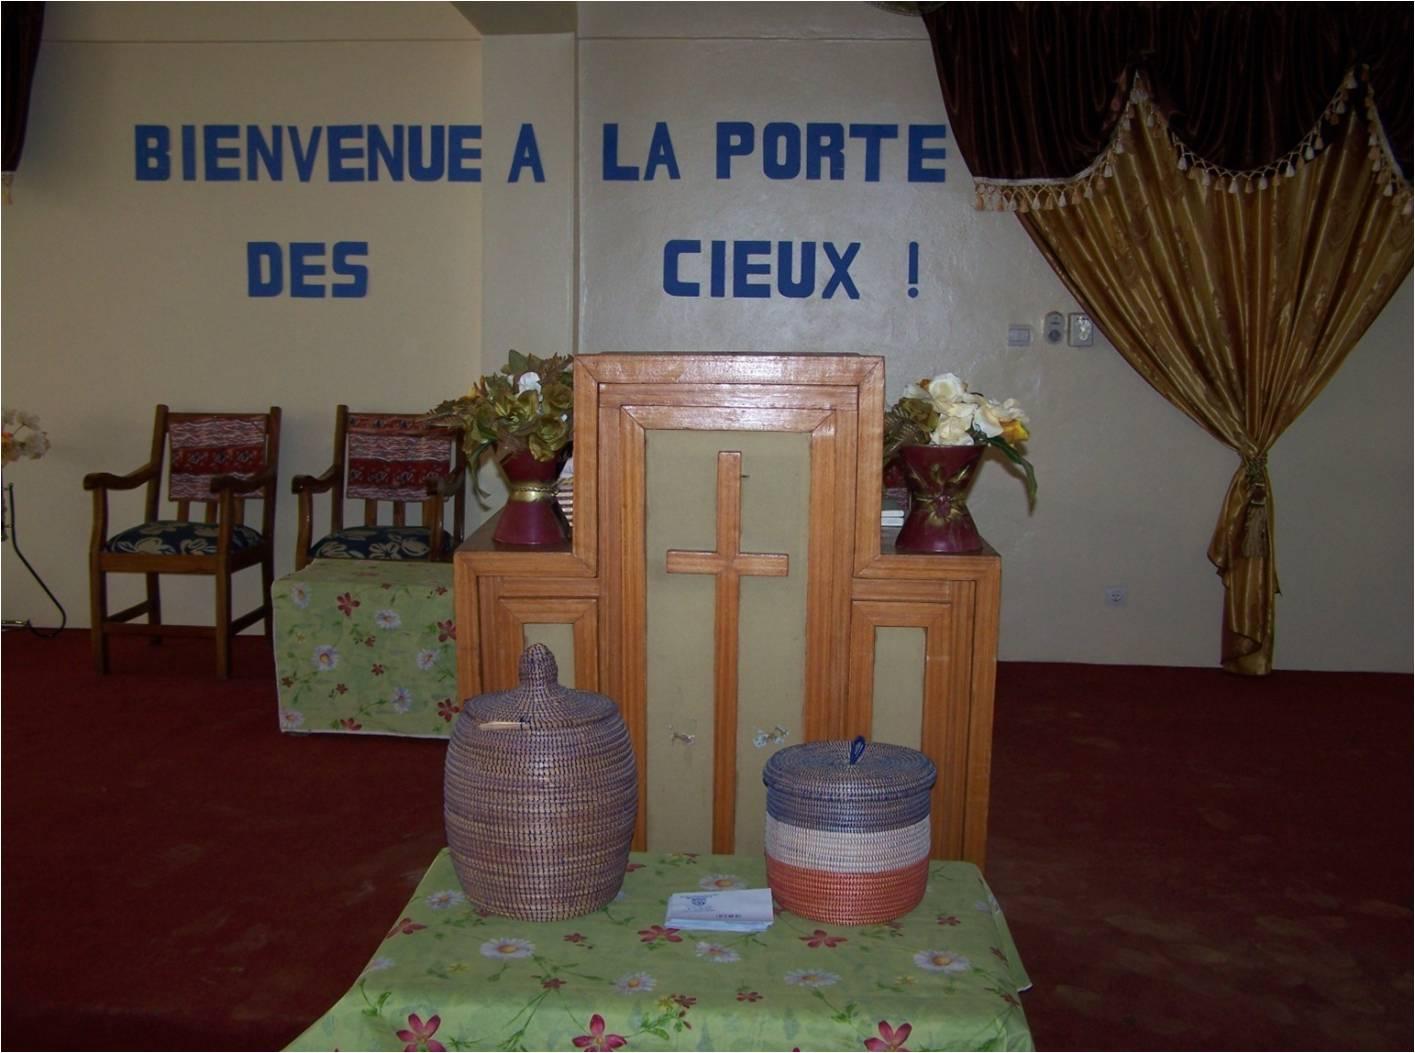 Estrade Eglise de Assemblée de Dieu de Béthel Dakar en 2009